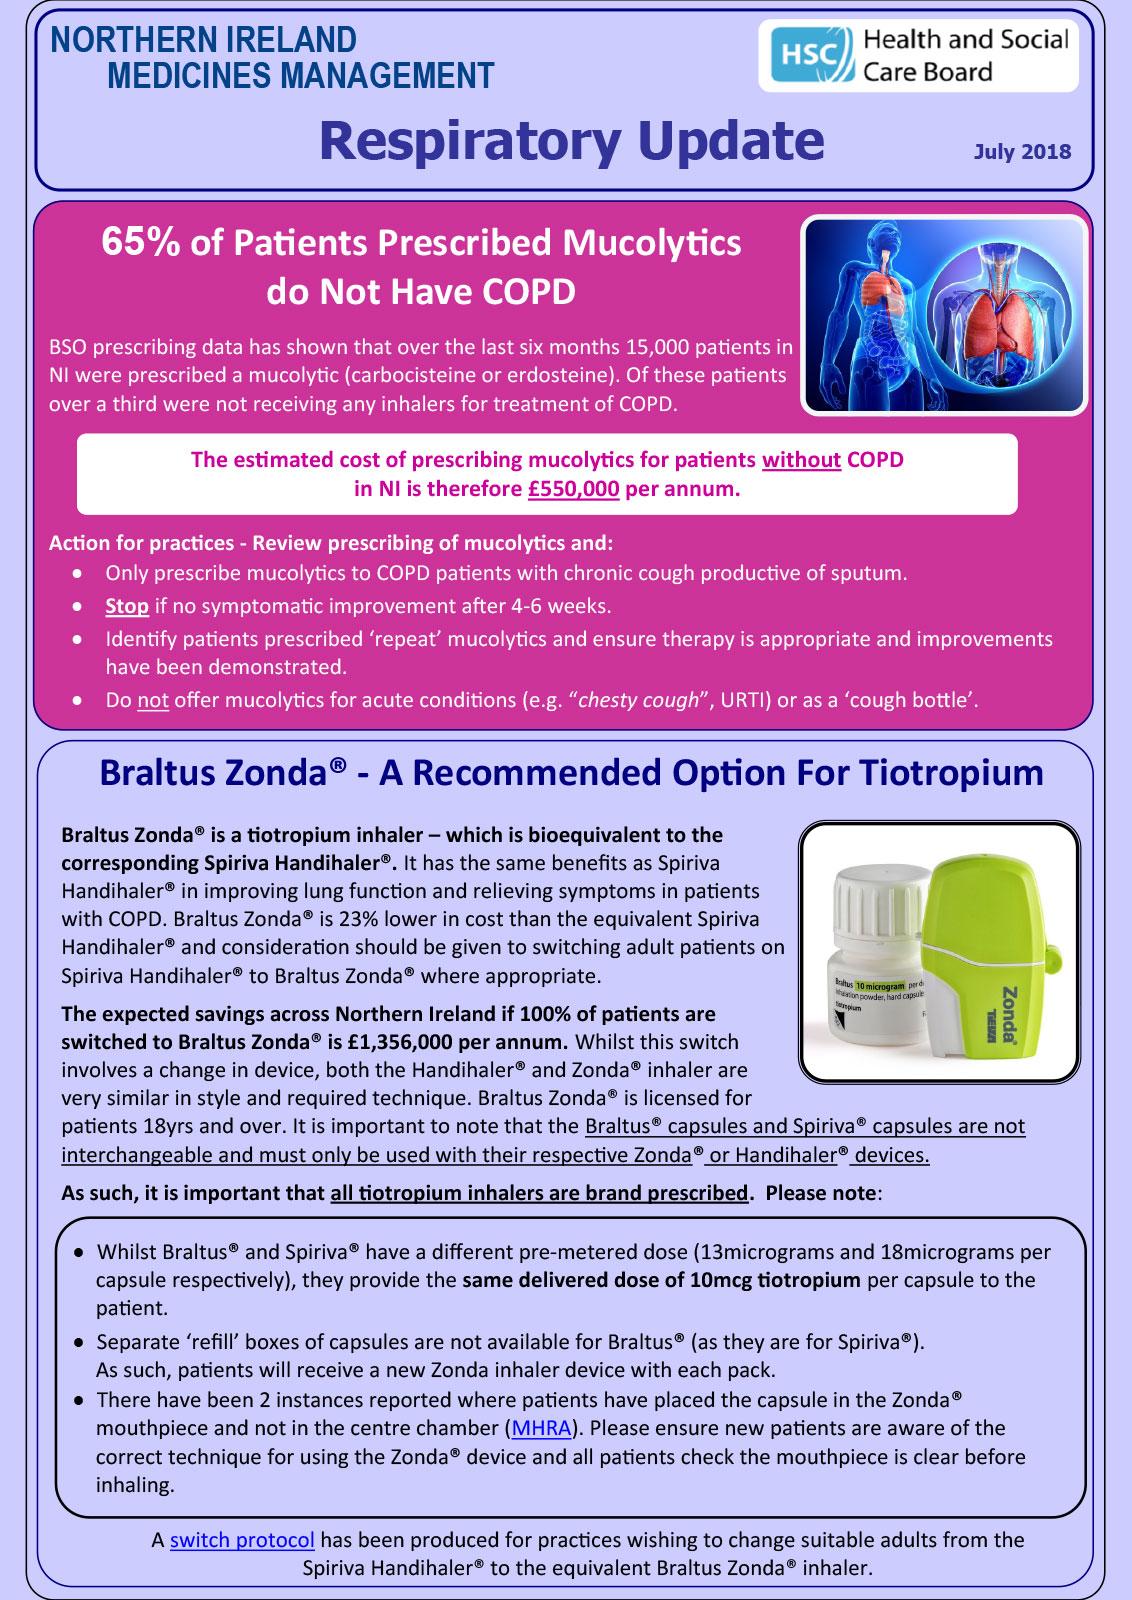 NORTHERN IRELAND MEDICINES MANAGEMENT Respiratory Up